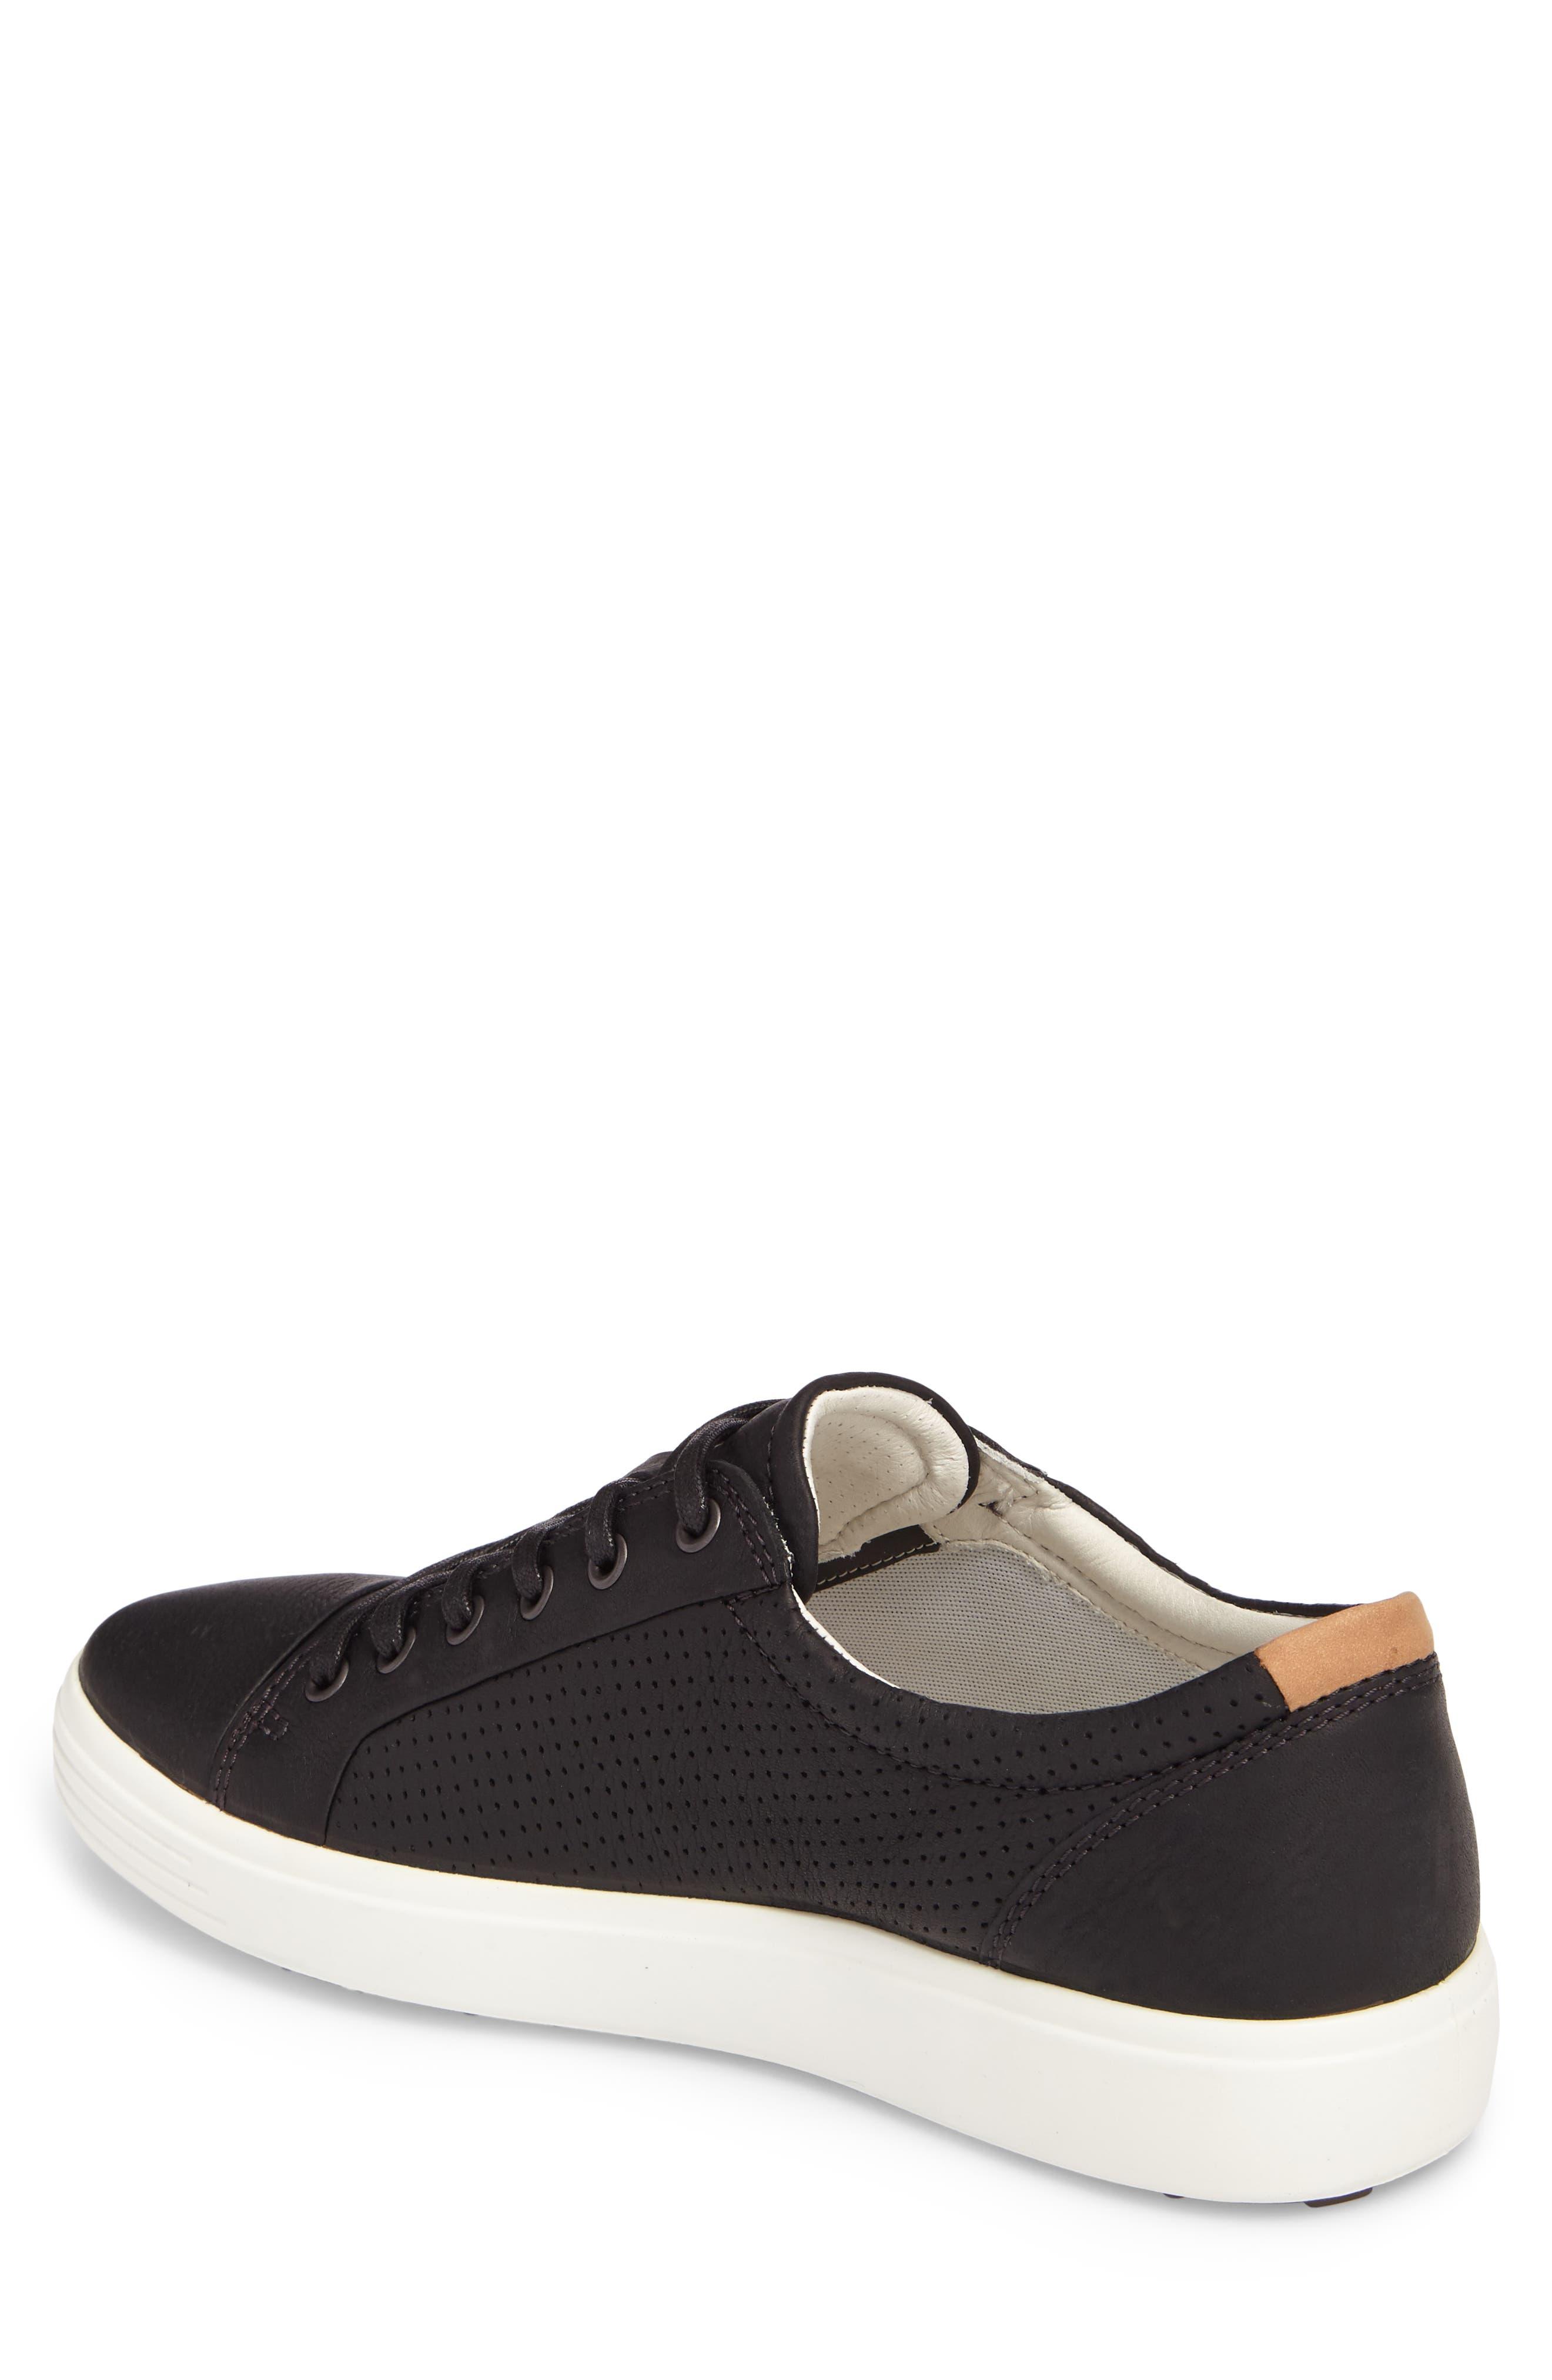 'Soft 7' Sneaker,                             Alternate thumbnail 2, color,                             BLACK LEATHER